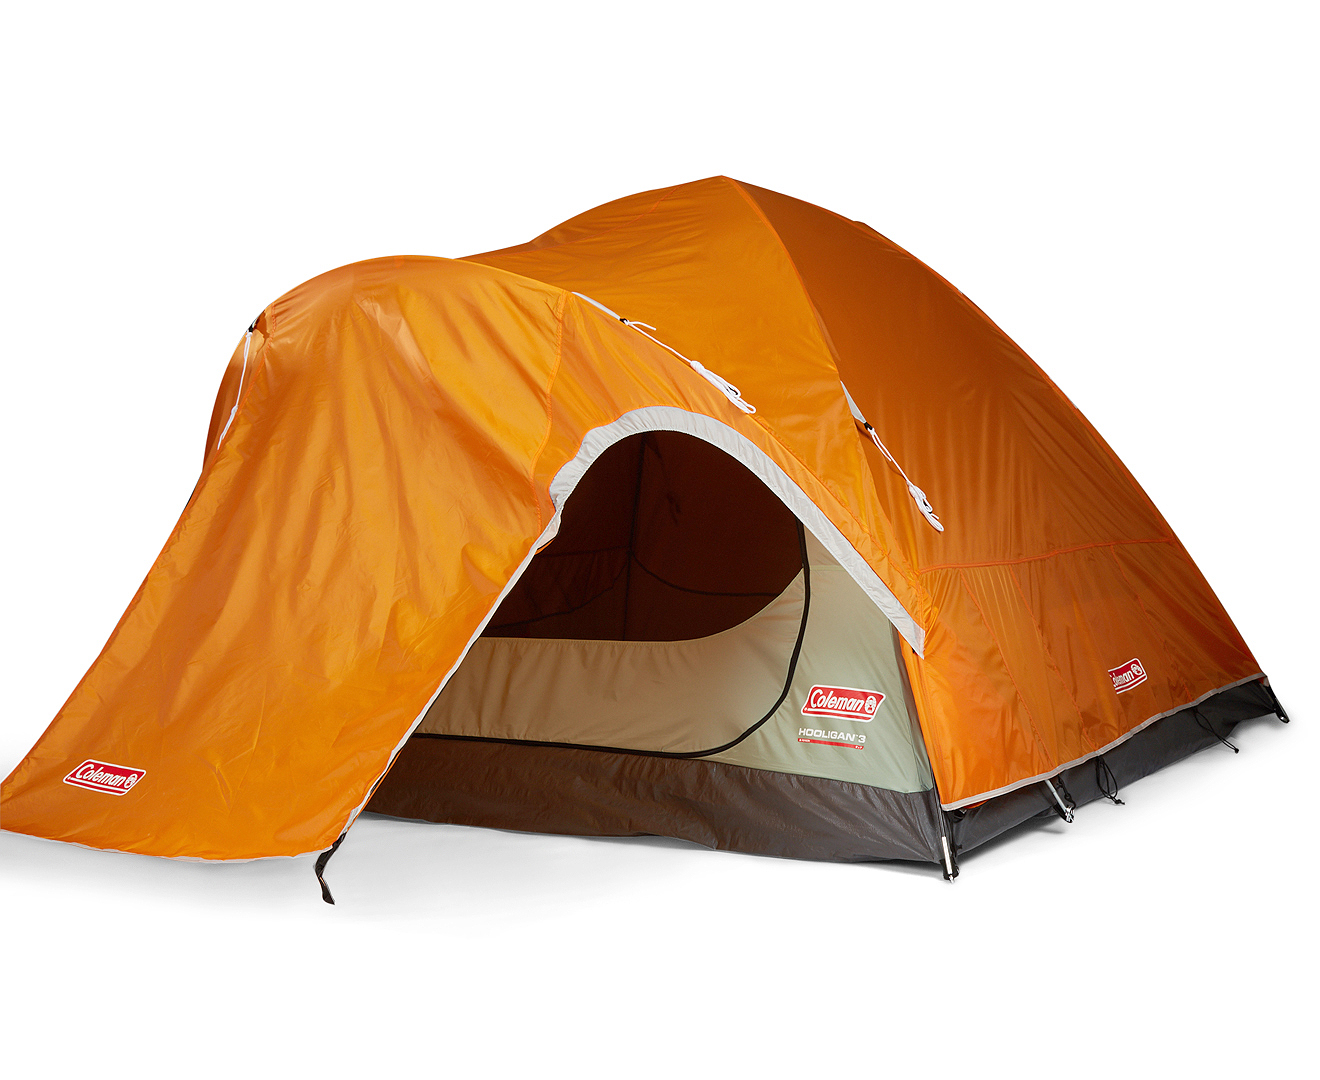 Coleman Hooligan 3-Person Hooligan Tent - Orange/Grey  sc 1 st  eBay & Coleman Hooligan 3-Person Hooligan Tent - Orange/Grey | eBay